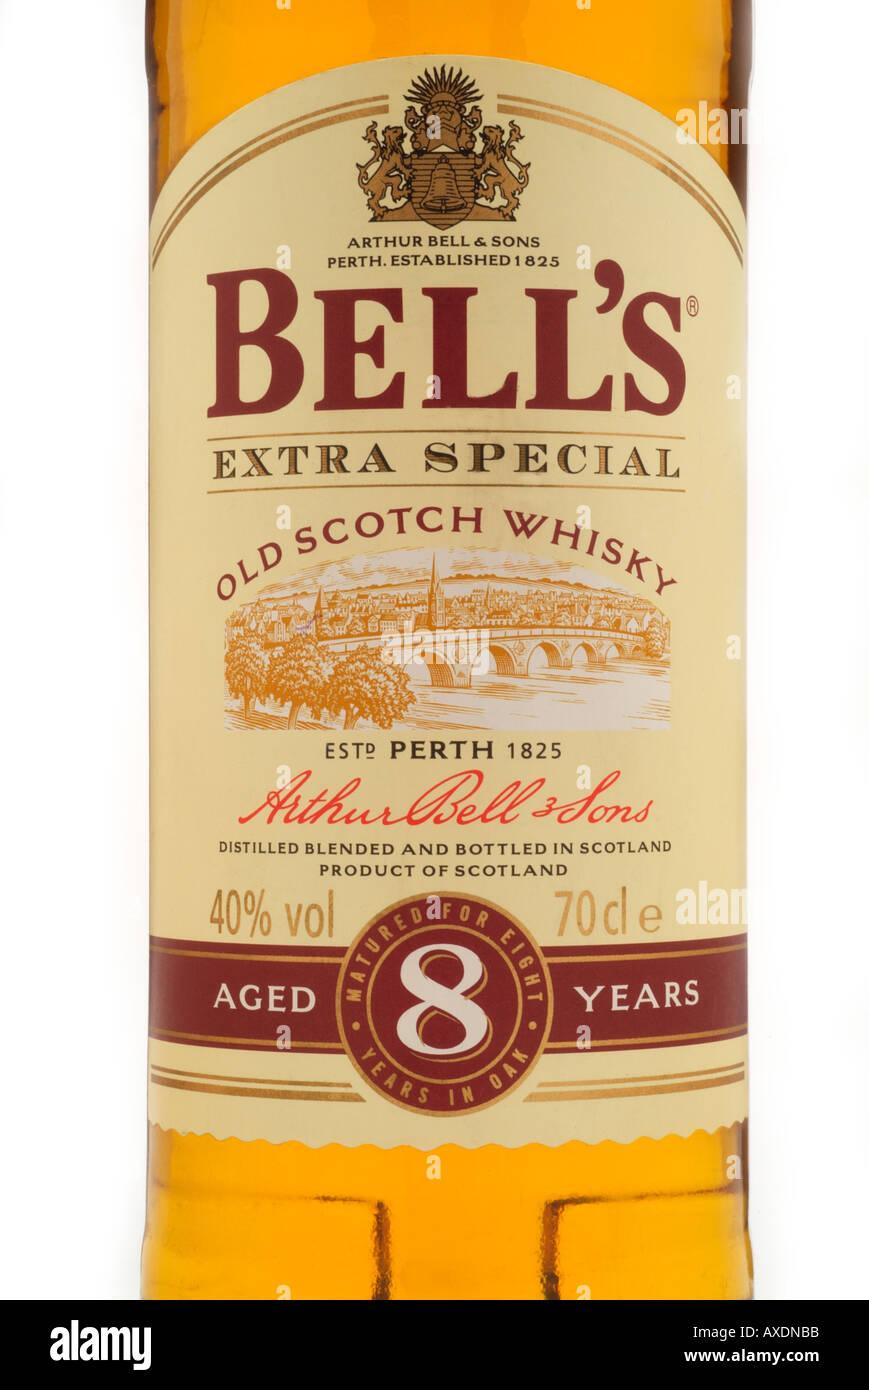 arthur bell's bell extra special old scotch malt whisky perth scotland oak caskoatmeal toffee taste afore ye go Stock Photo